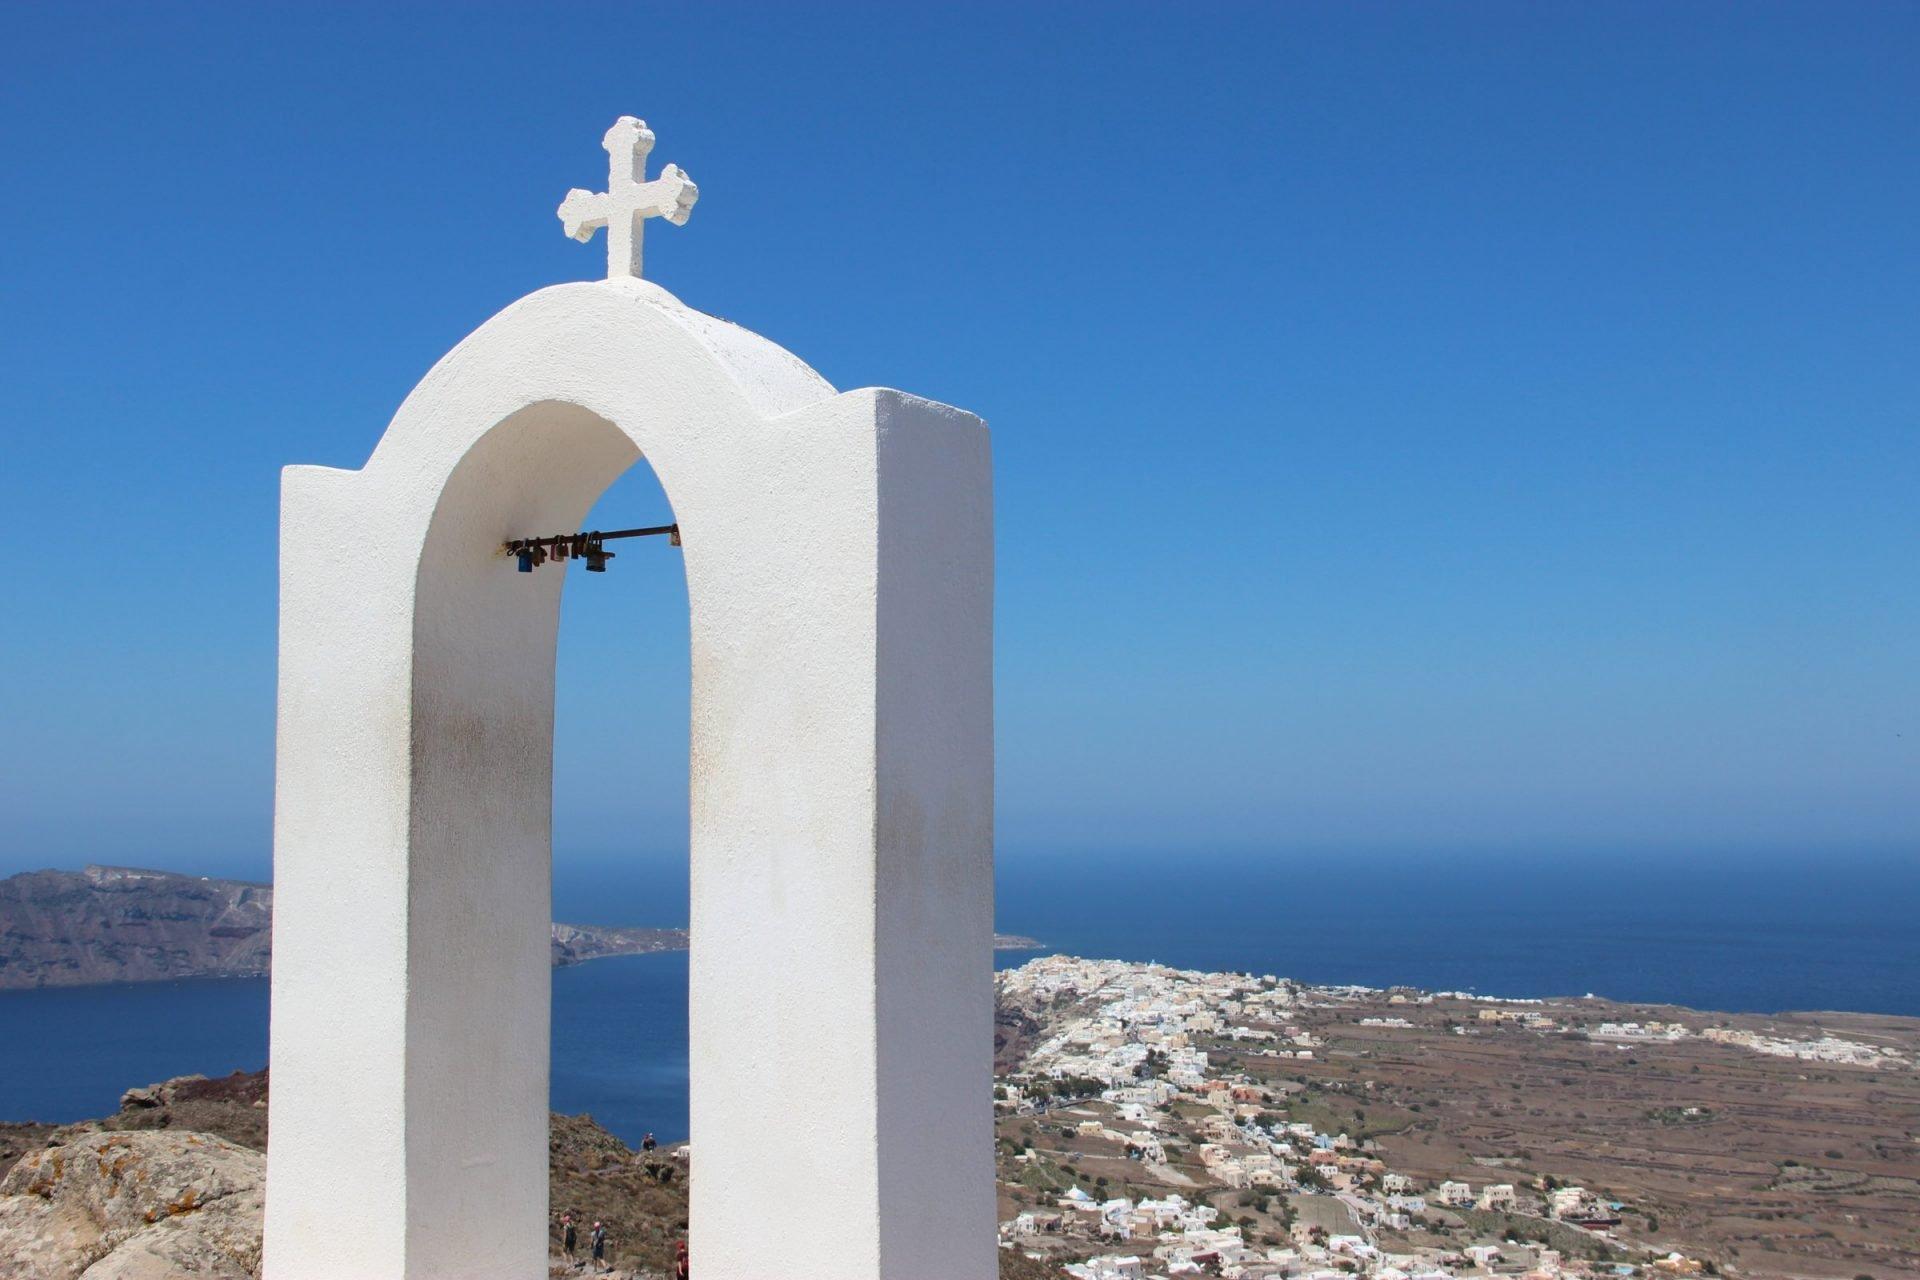 Locks In Church Gable In Island